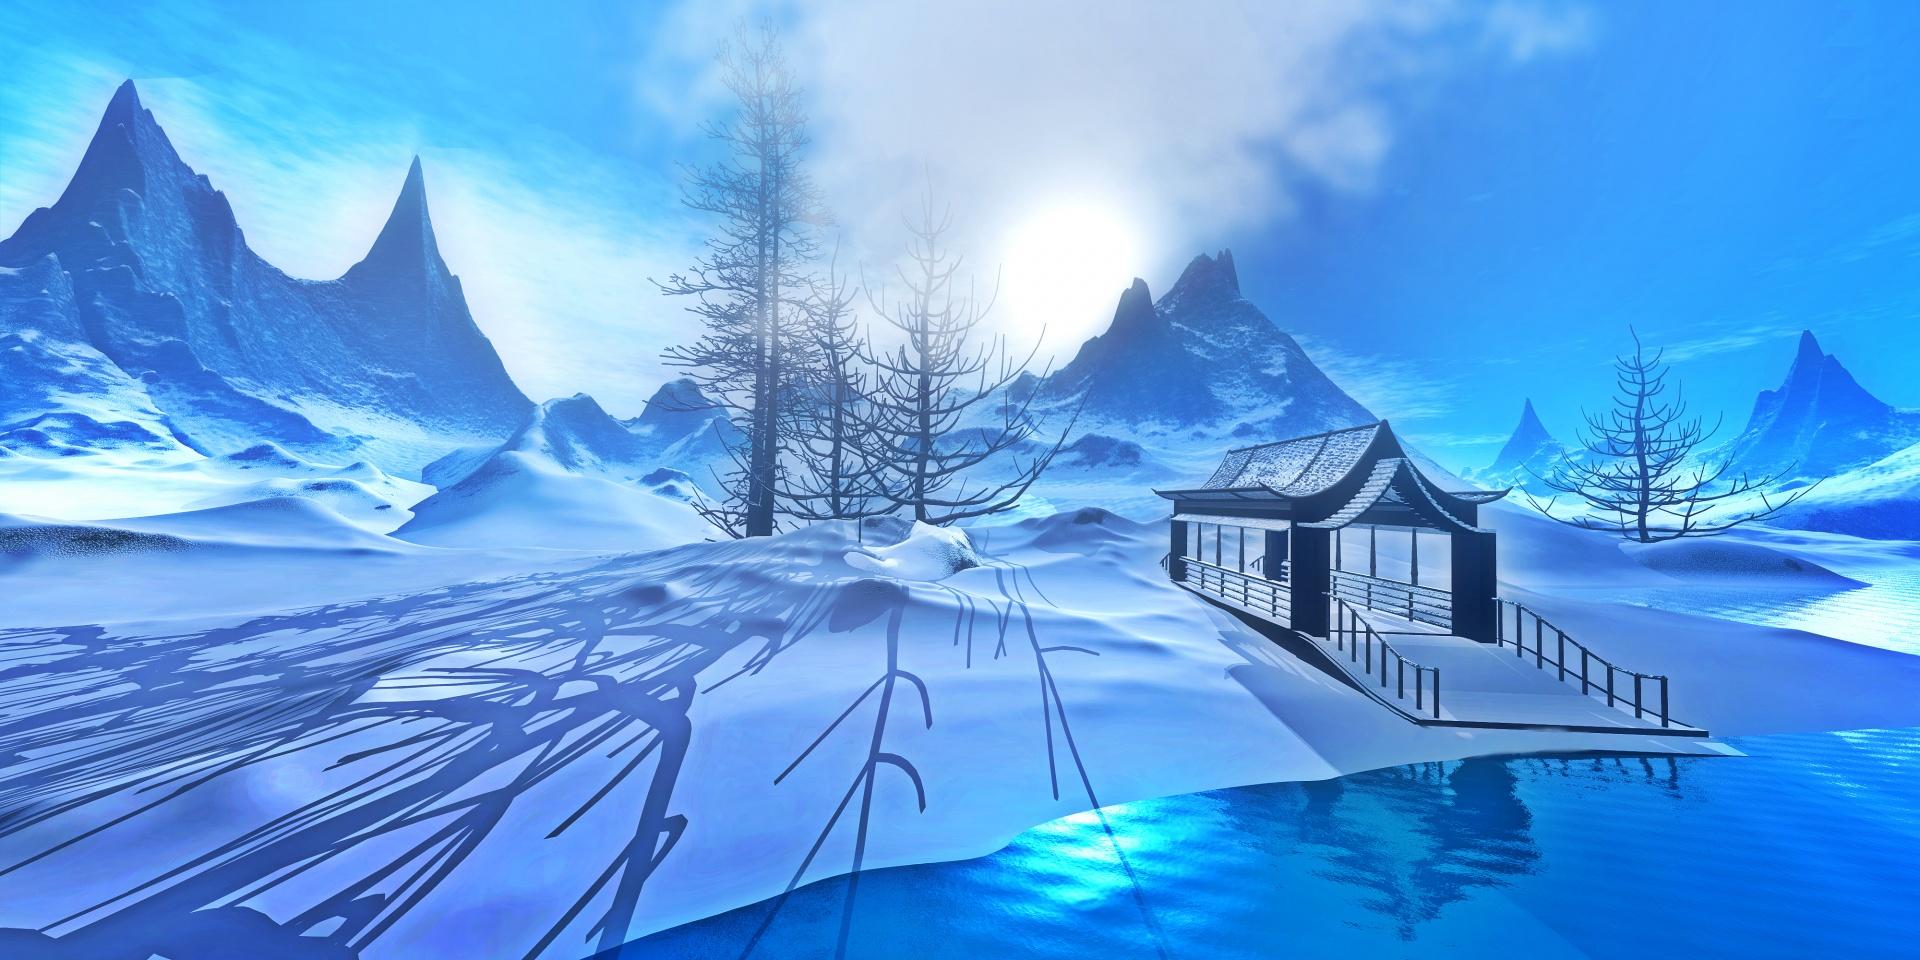 Anime Snow Wallpaper Winter Fantasy 2 Free Stock Photo Public Domain Pictures